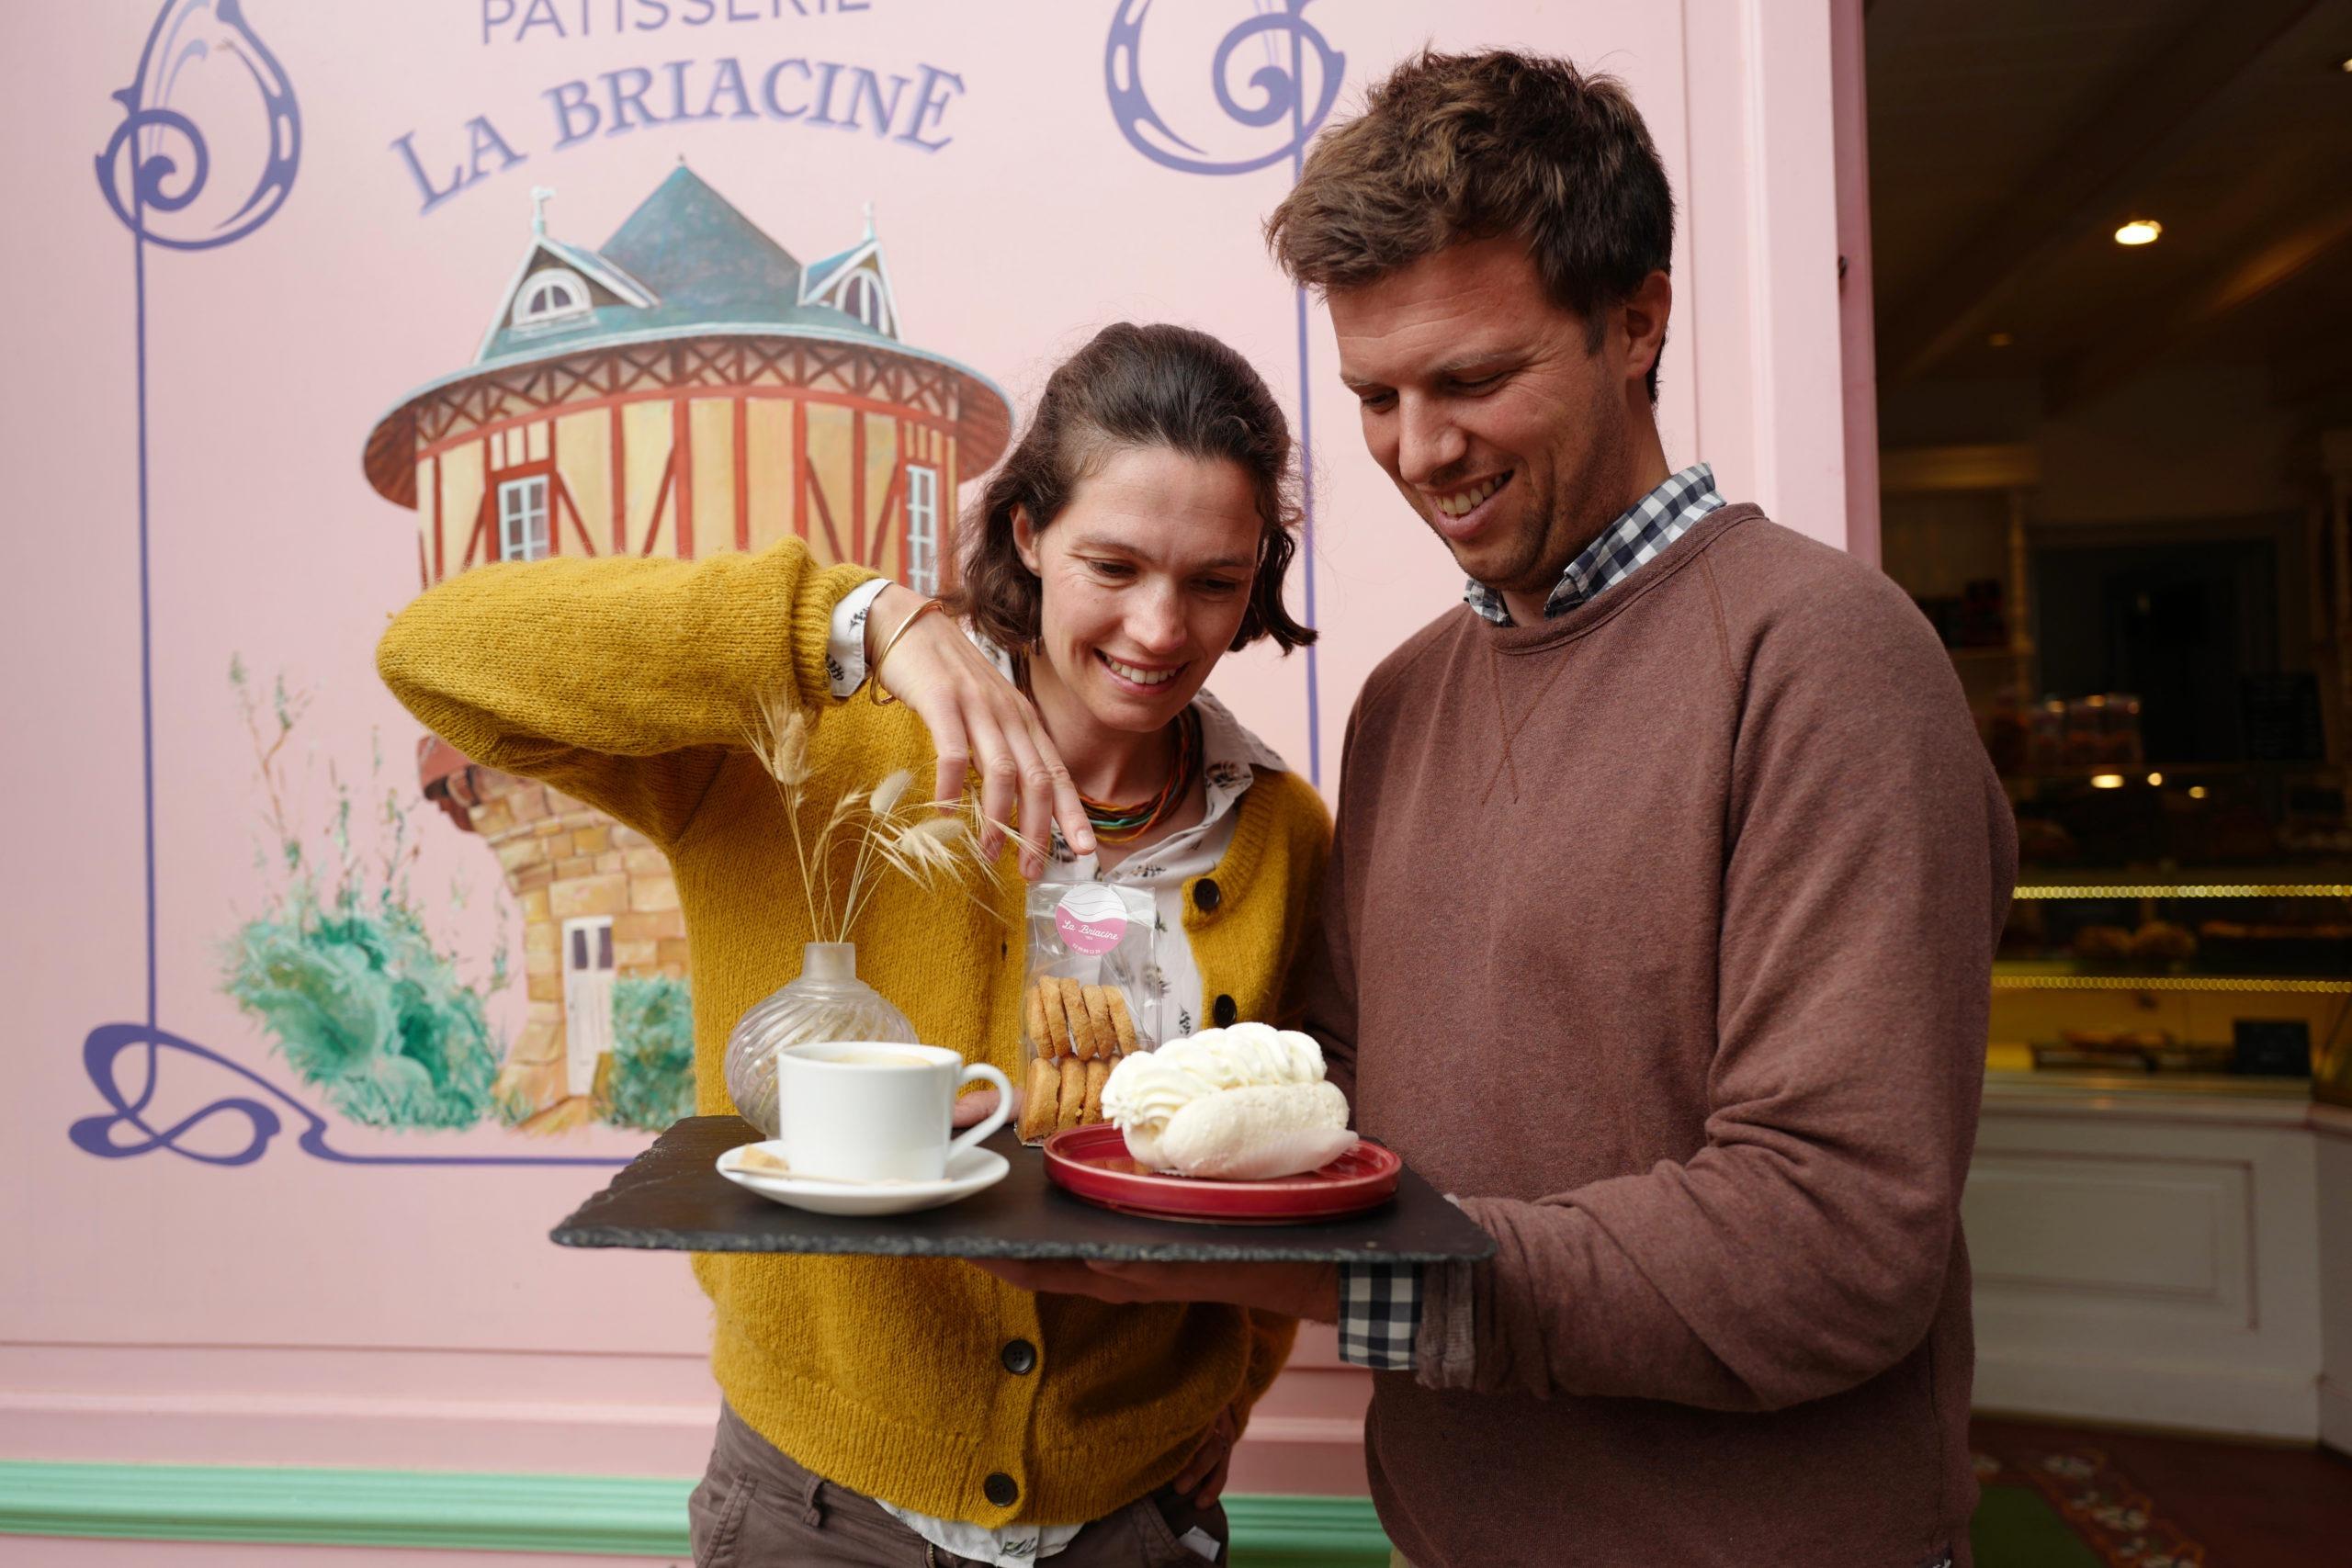 Caroline et Matthieu Gailly, Pâtisserie La Briacine Saint-Briac